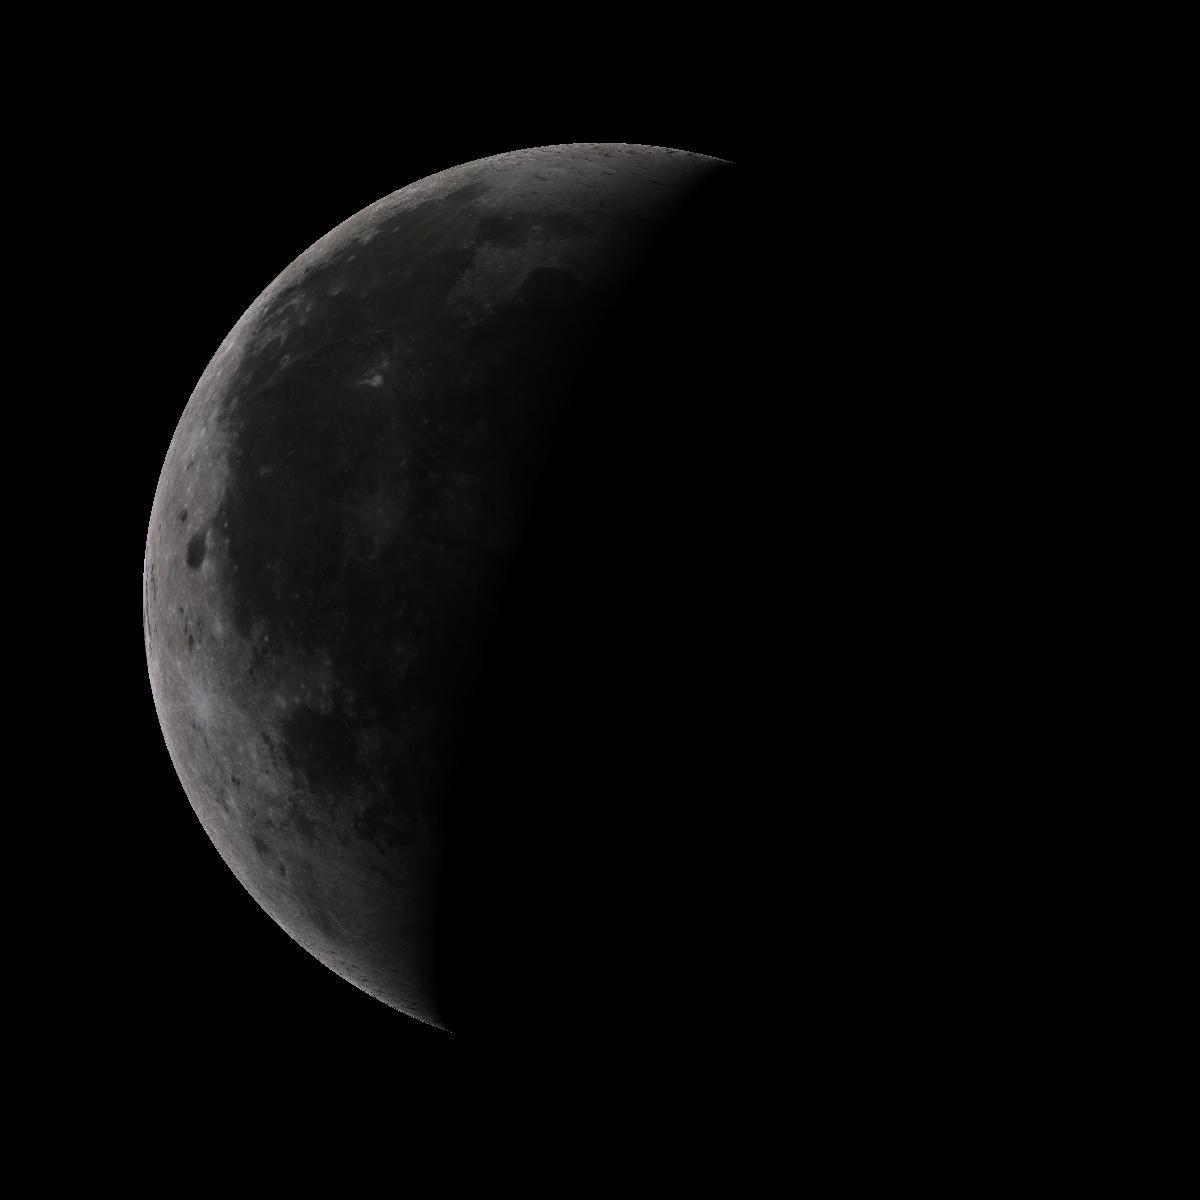 Lune du 26 juillet 2019